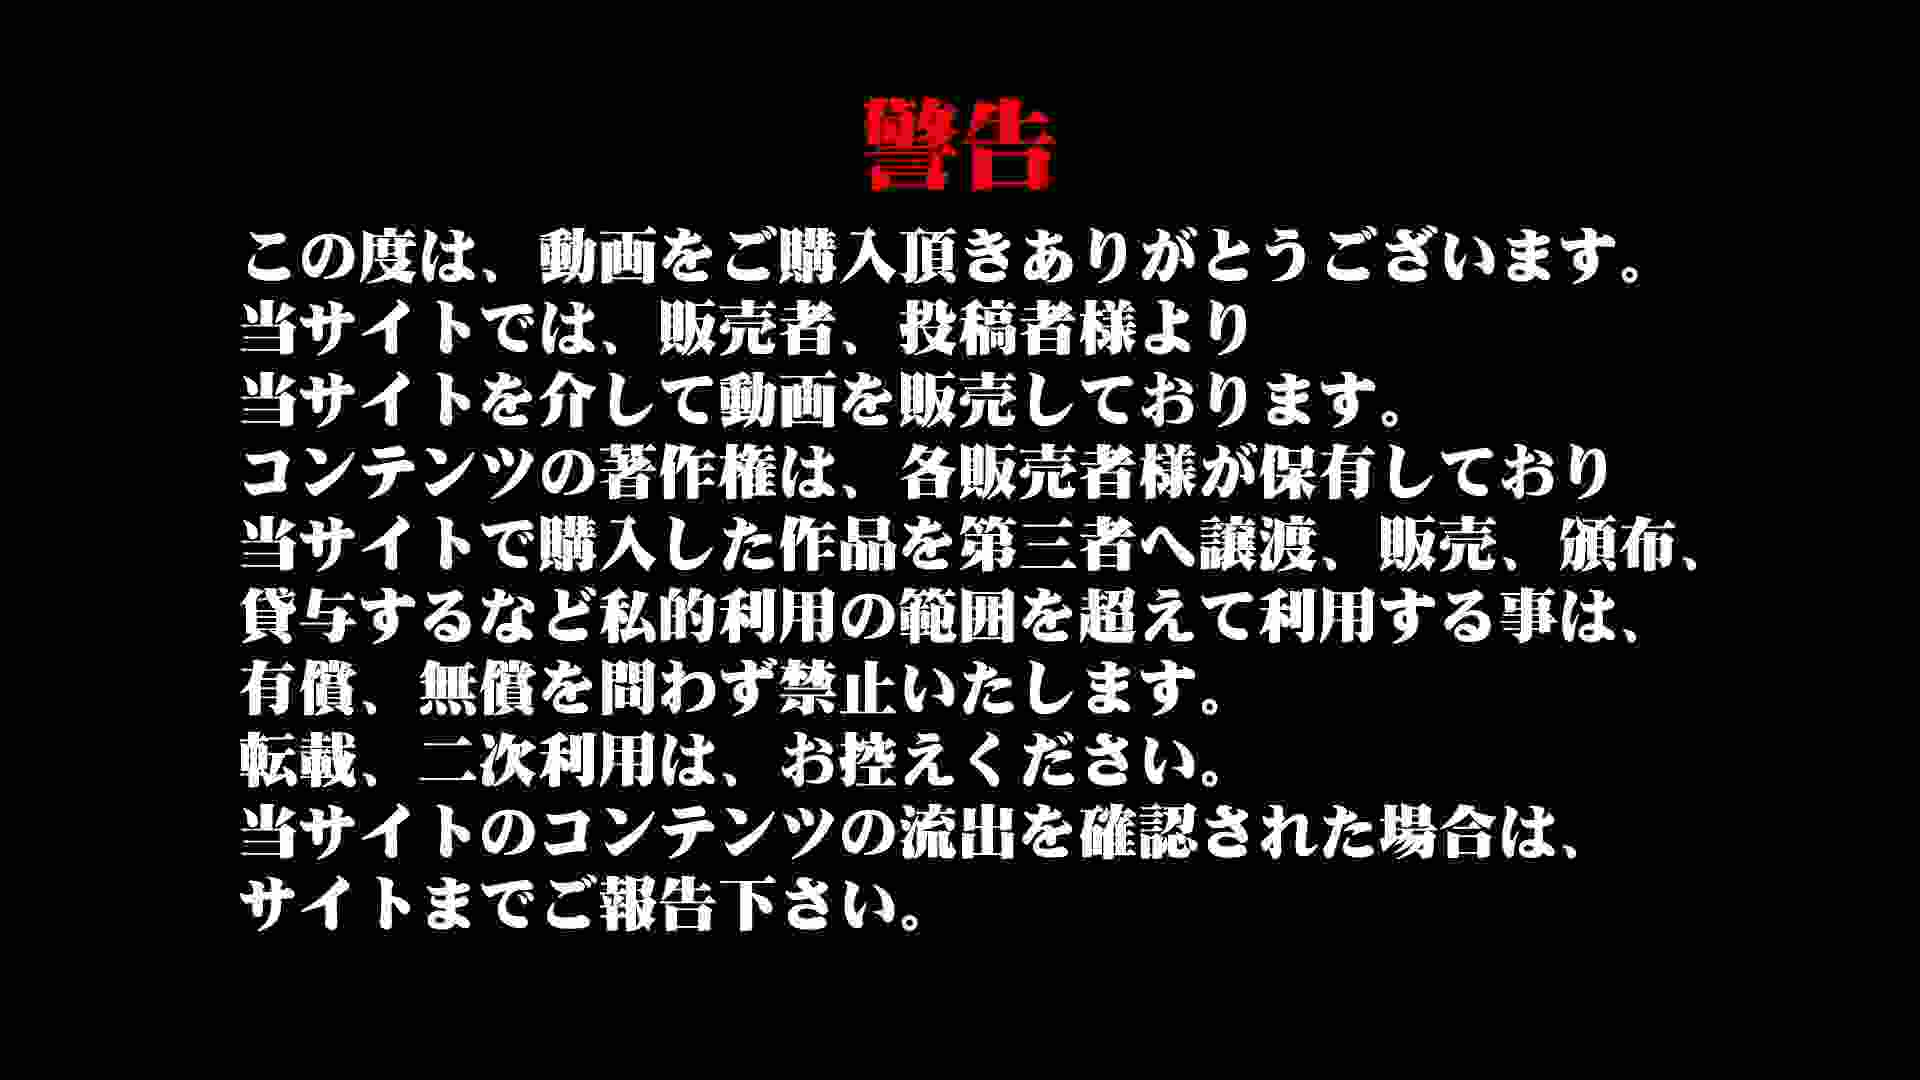 Aquaな露天風呂Vol.909 盗撮シリーズ | 露天風呂編  91PIX 1